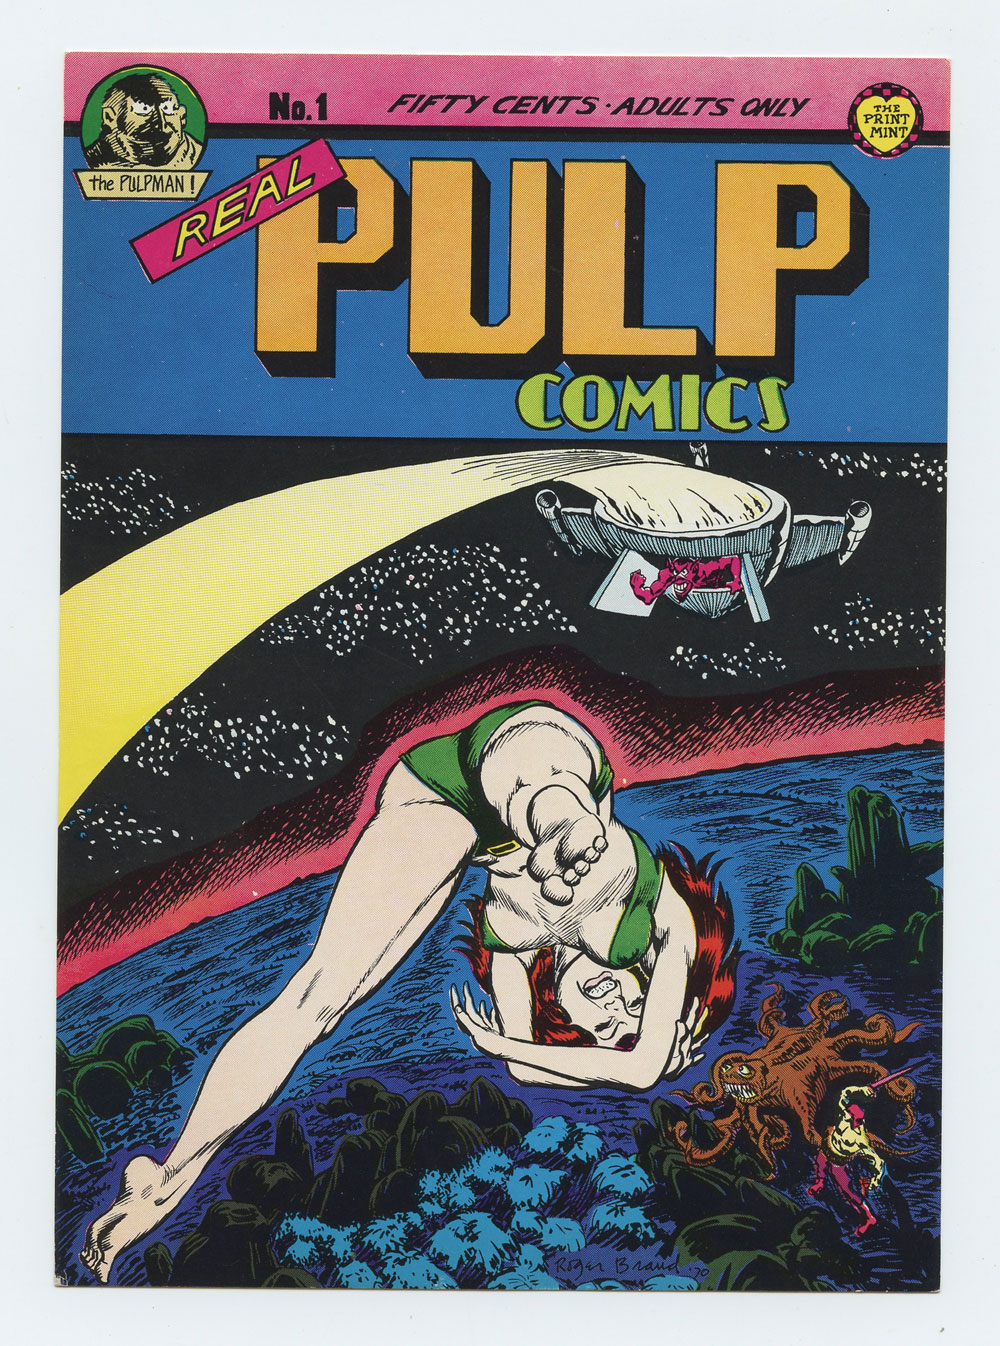 Real Pulp Comics Postcard No. 1 edition Promo 1973 Roger Brand